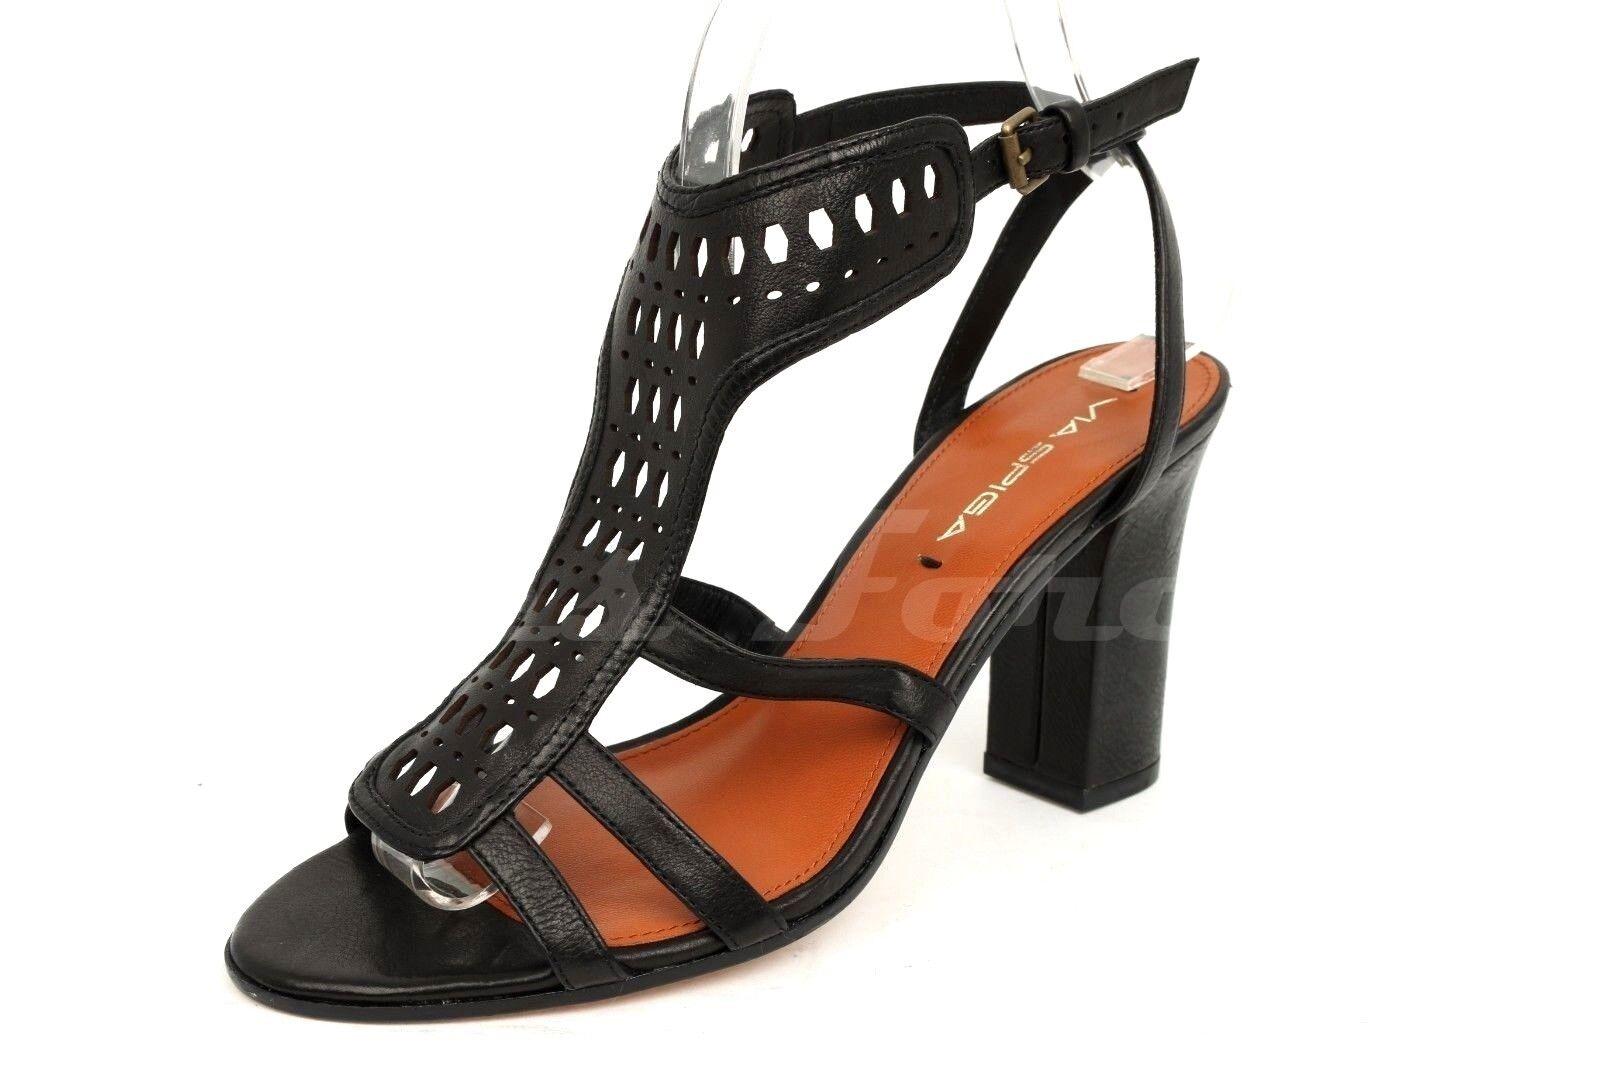 Stuart Weitzman New Women's Beige Woven Leather Slingback Sandals Shoes Size 11M